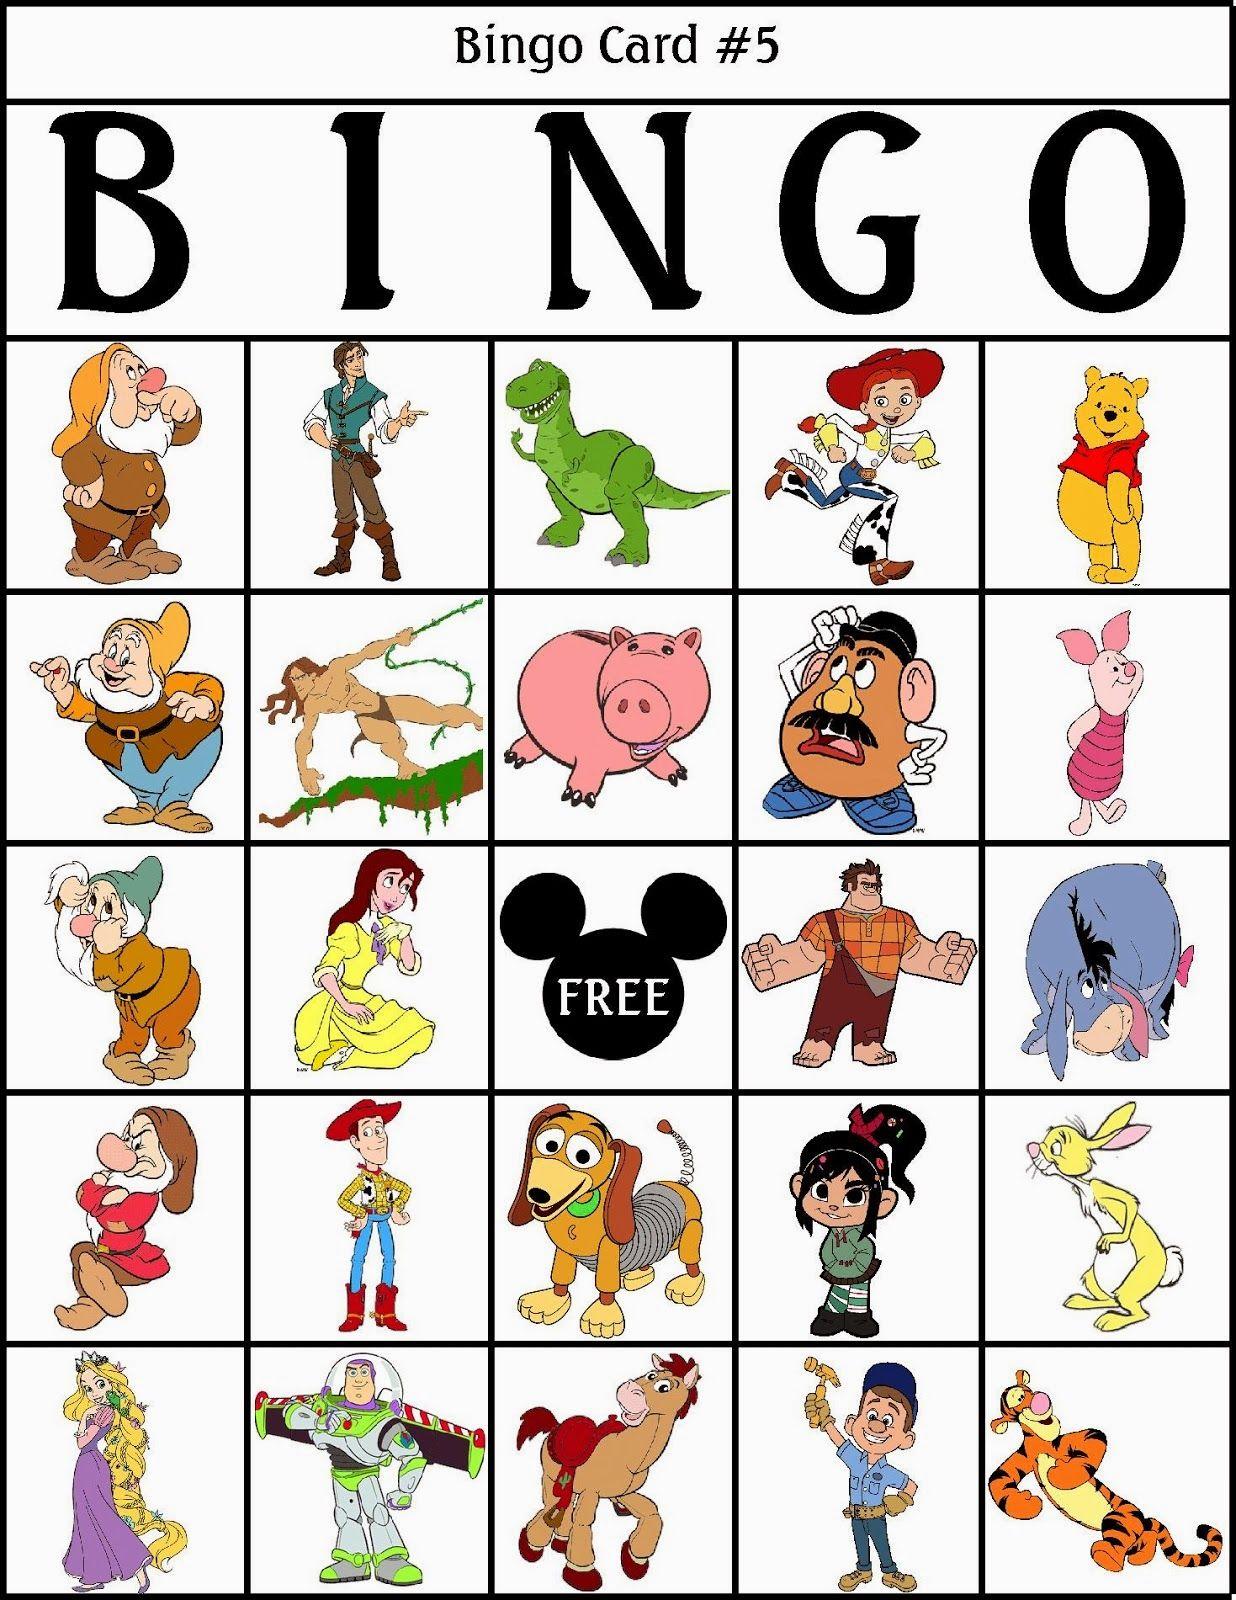 Gratis Backgamon bingo ortiz juego-114768